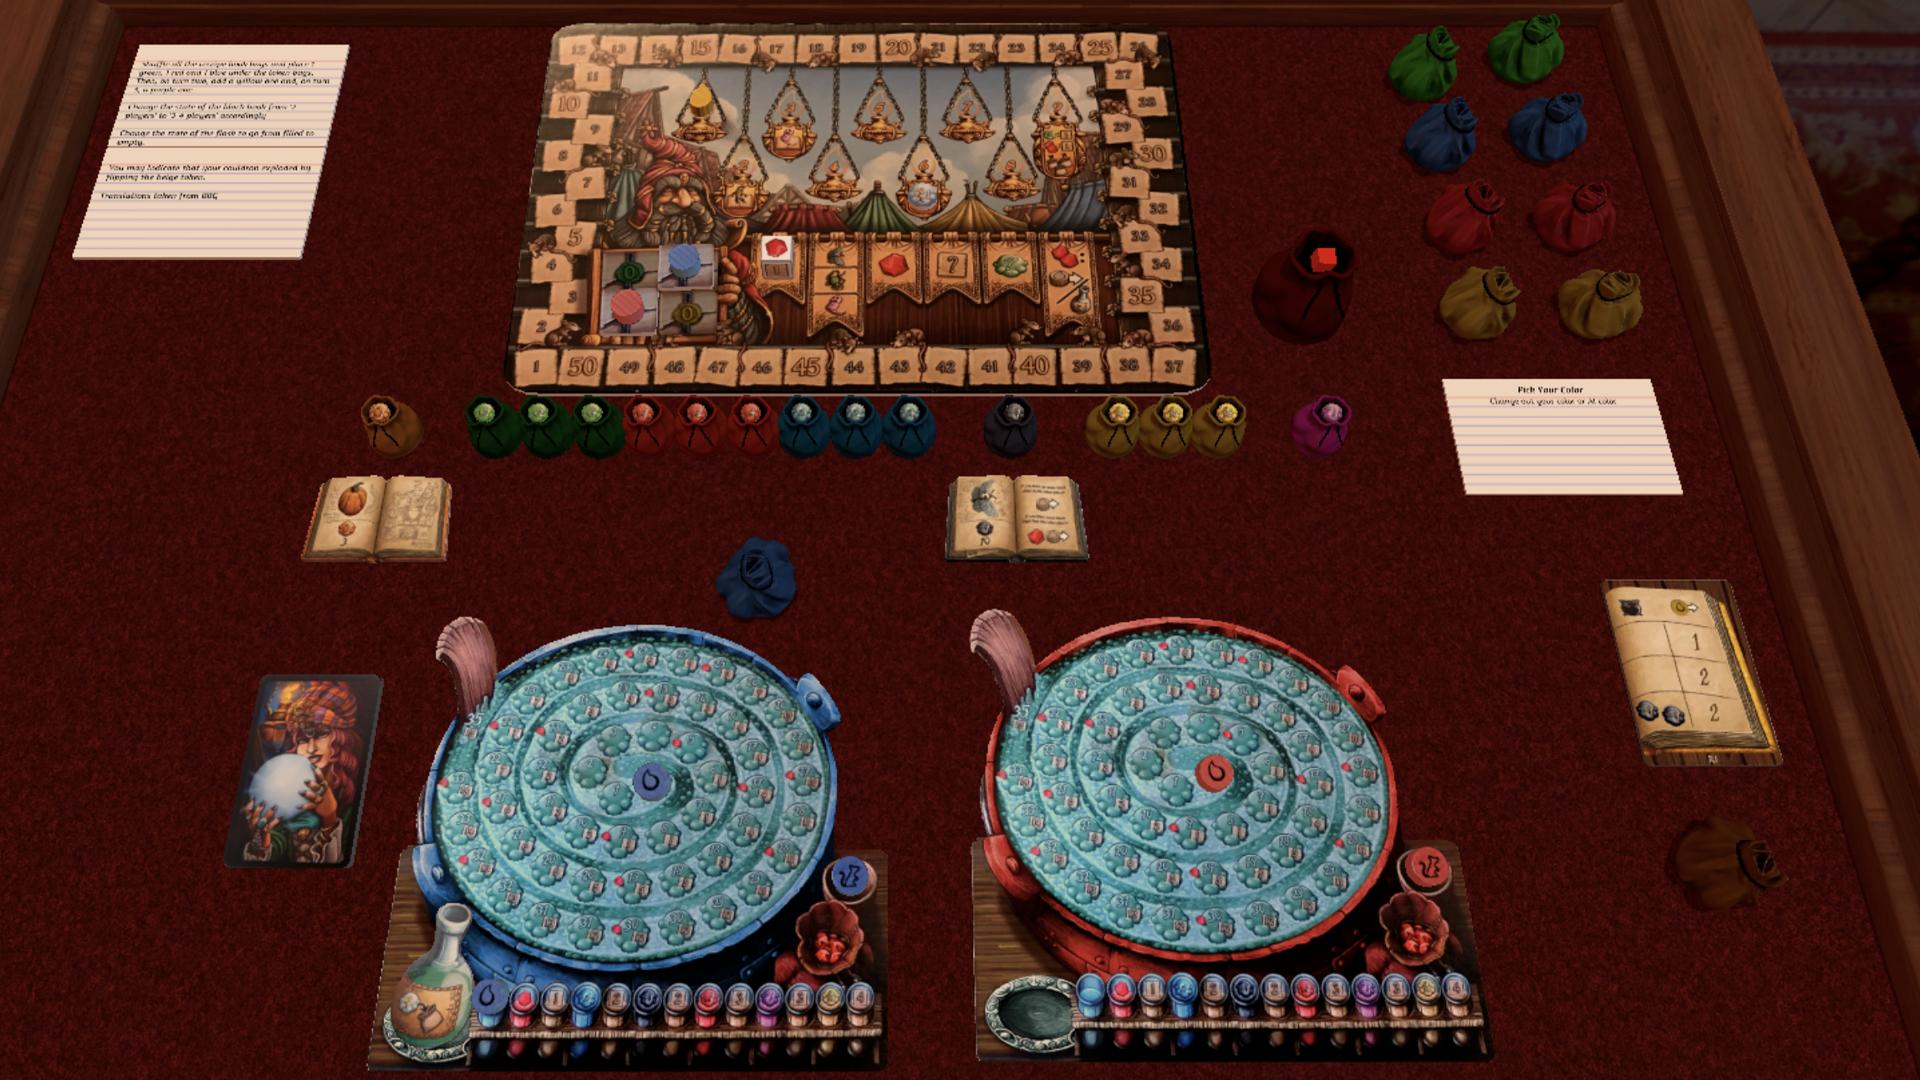 tabletop-simulator-mod-quacks-of-quedlinburg.png